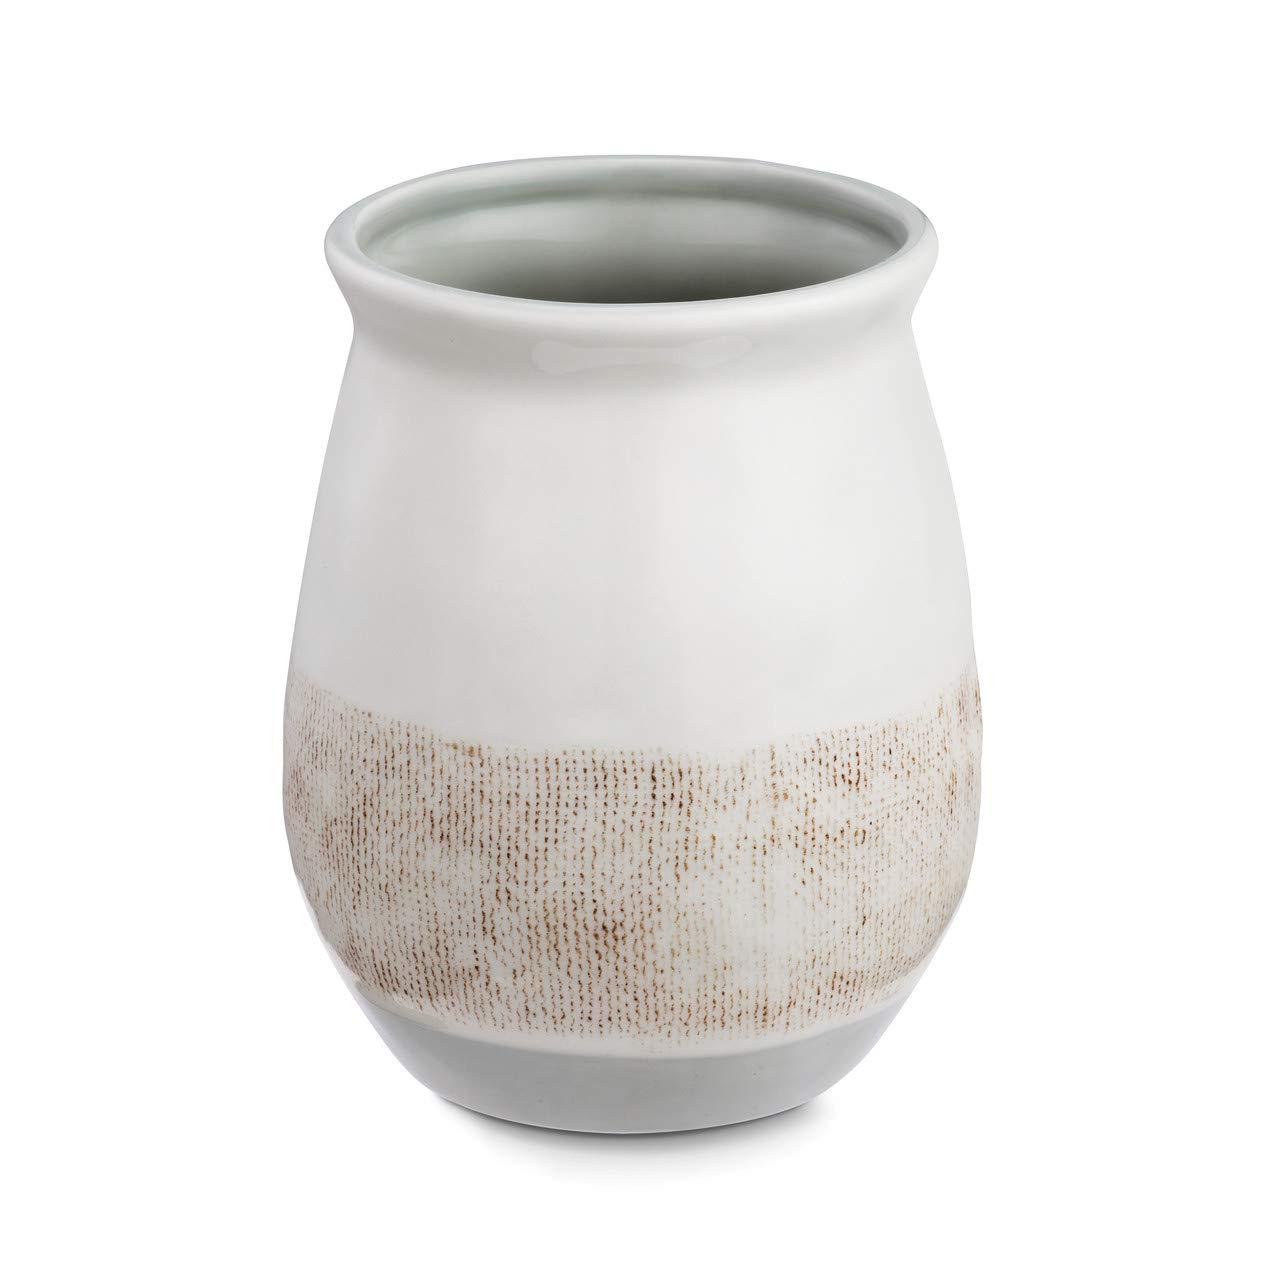 Linen Kitchen Blessed Glossy White 7 x 5 Ceramic Stoneware Kitchen Utensil Crock by DEMDACO